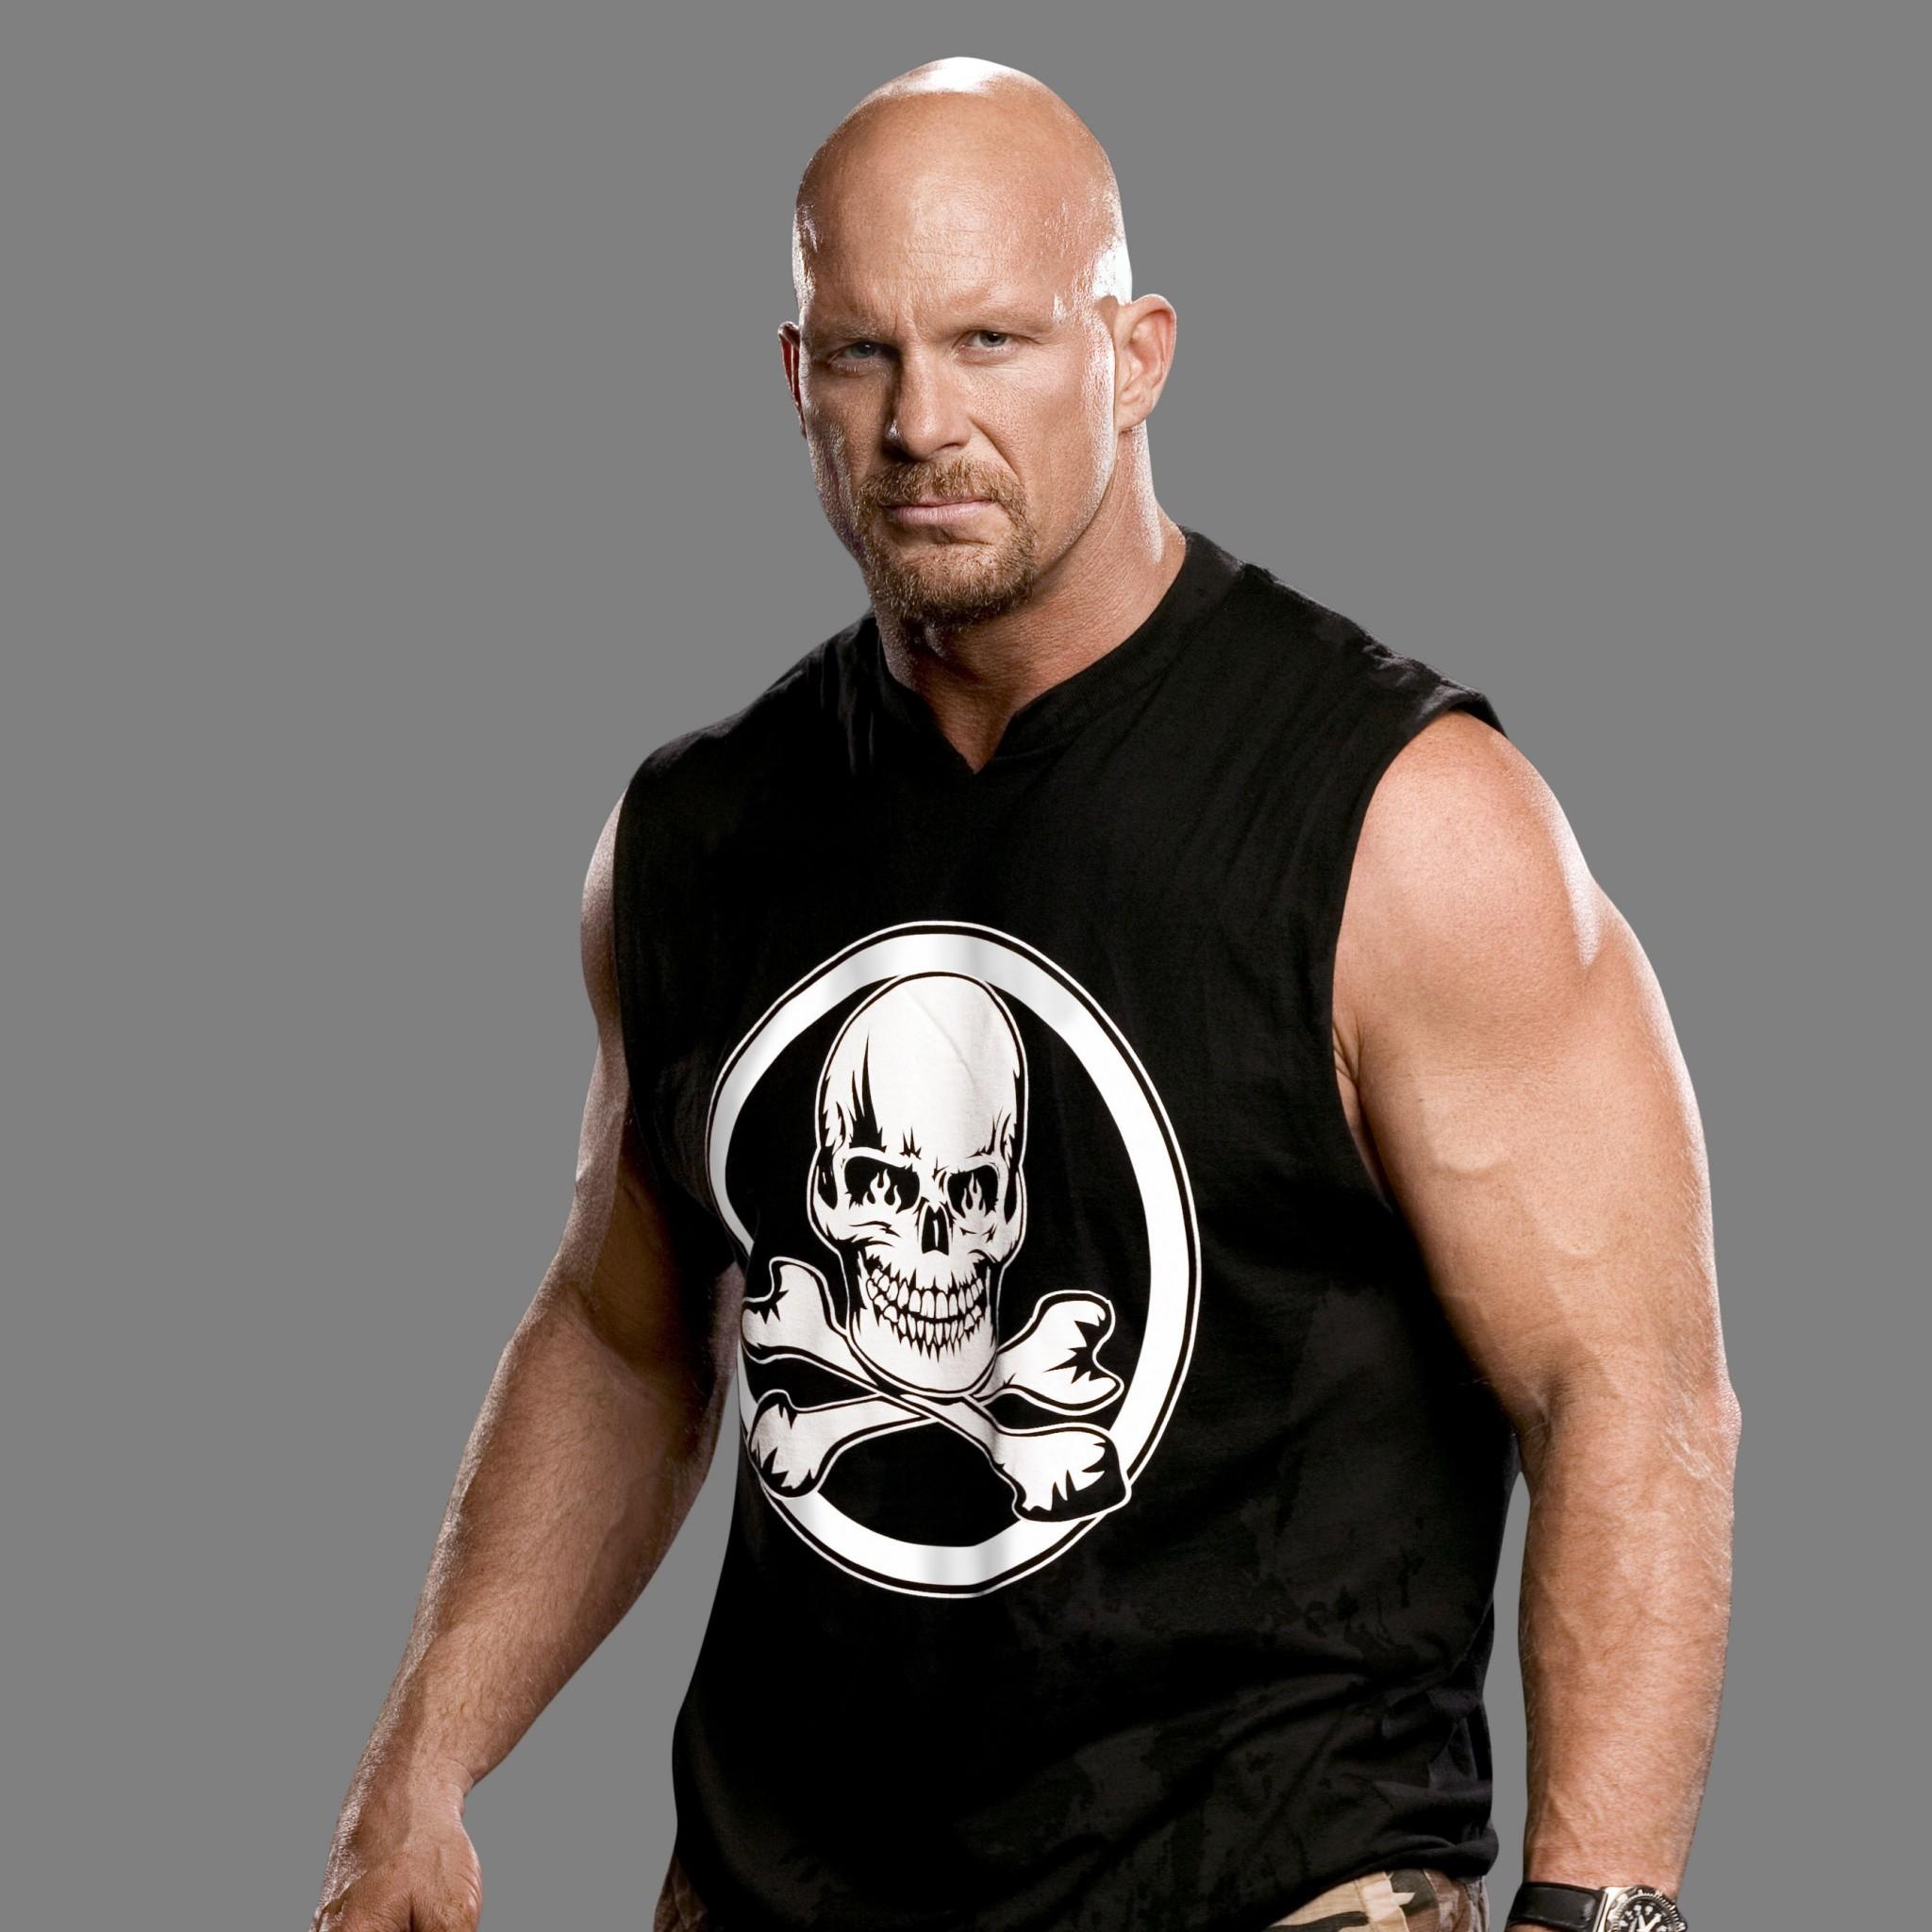 Download WWE Stone Cold Steve Austin 2048 x 2048 Wallpapers – 4570957 –  sport entertainment series raw rebuild wrestling smackdwon wwenxt | mobile9